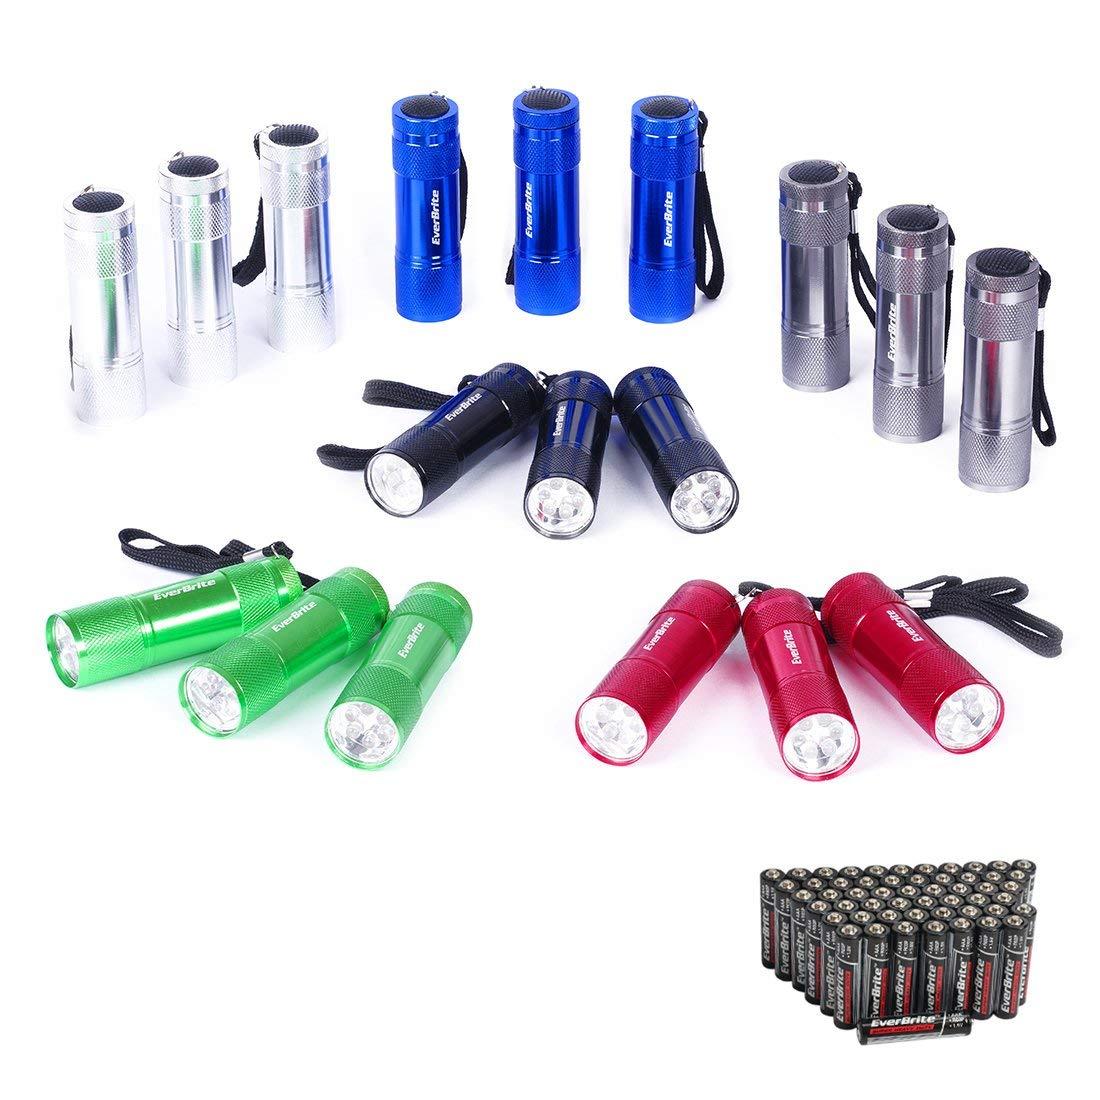 Mini Flashlight Keychain Pack